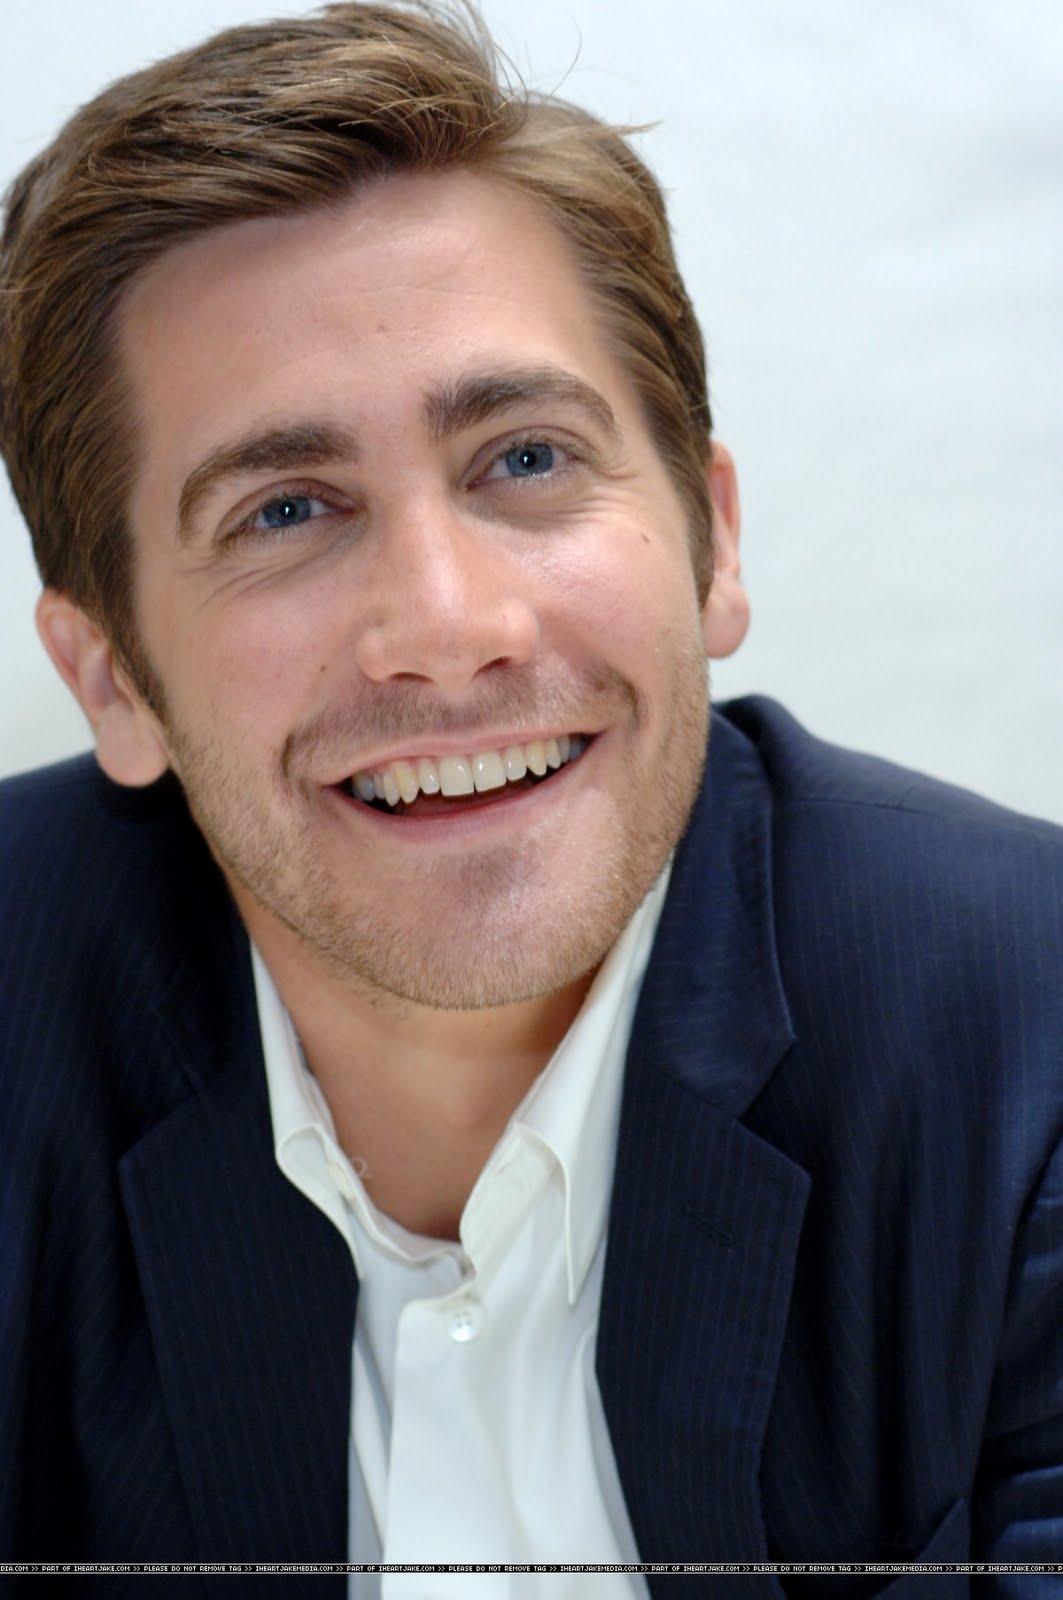 Jake Gyllenhaal Talks About Kids the Way Tabloids Pretend ... |Old Jake Gyllenhaal